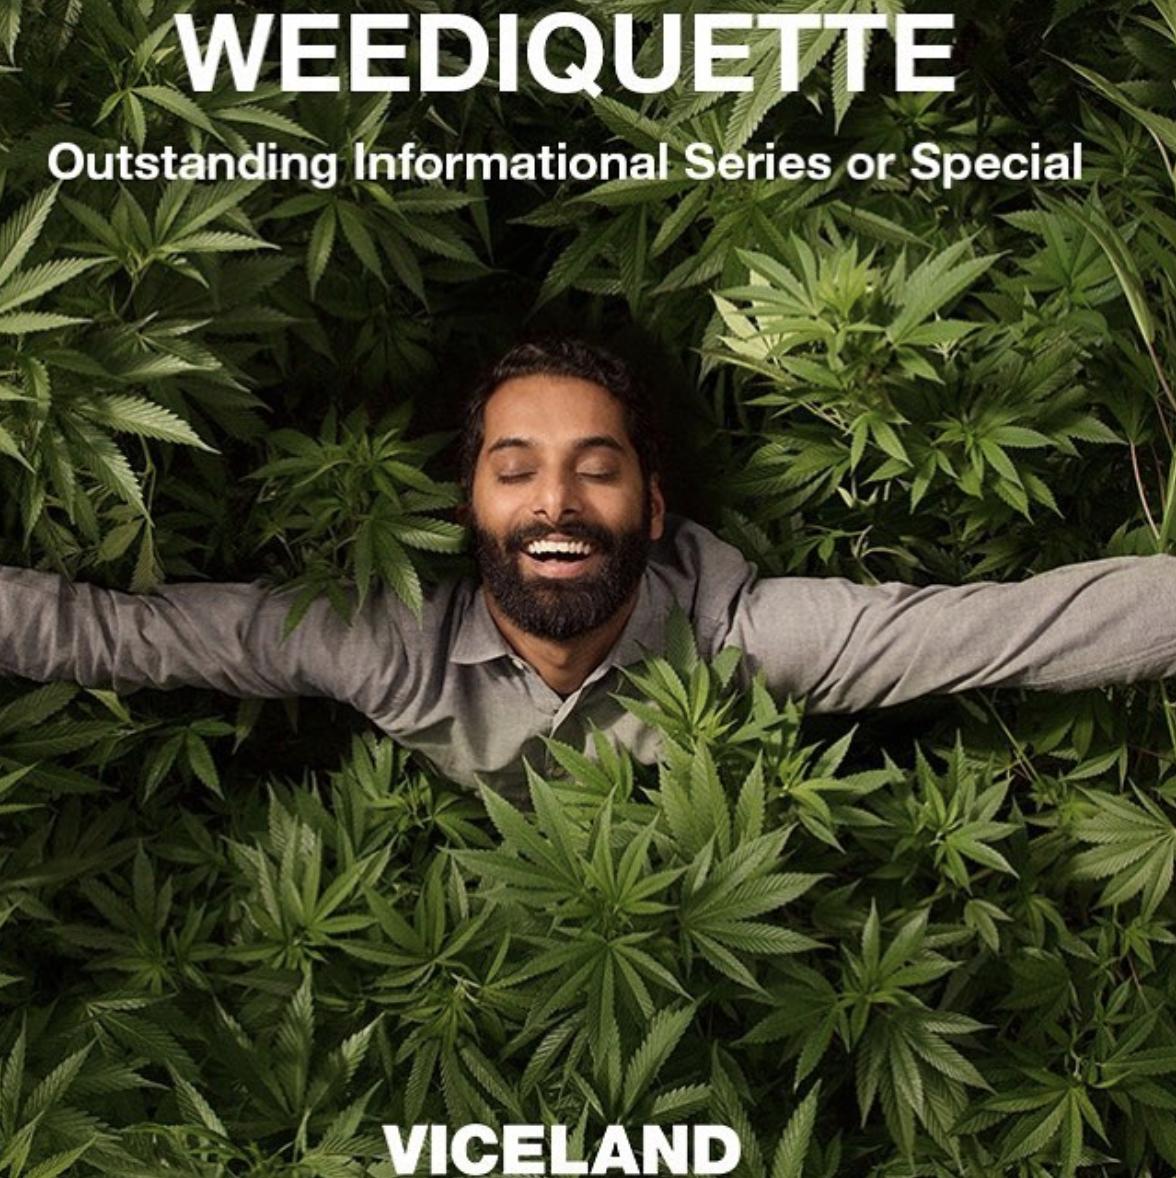 Krishna Sai Andavolu | Viceland's marijuana-based hit show, Weediquette